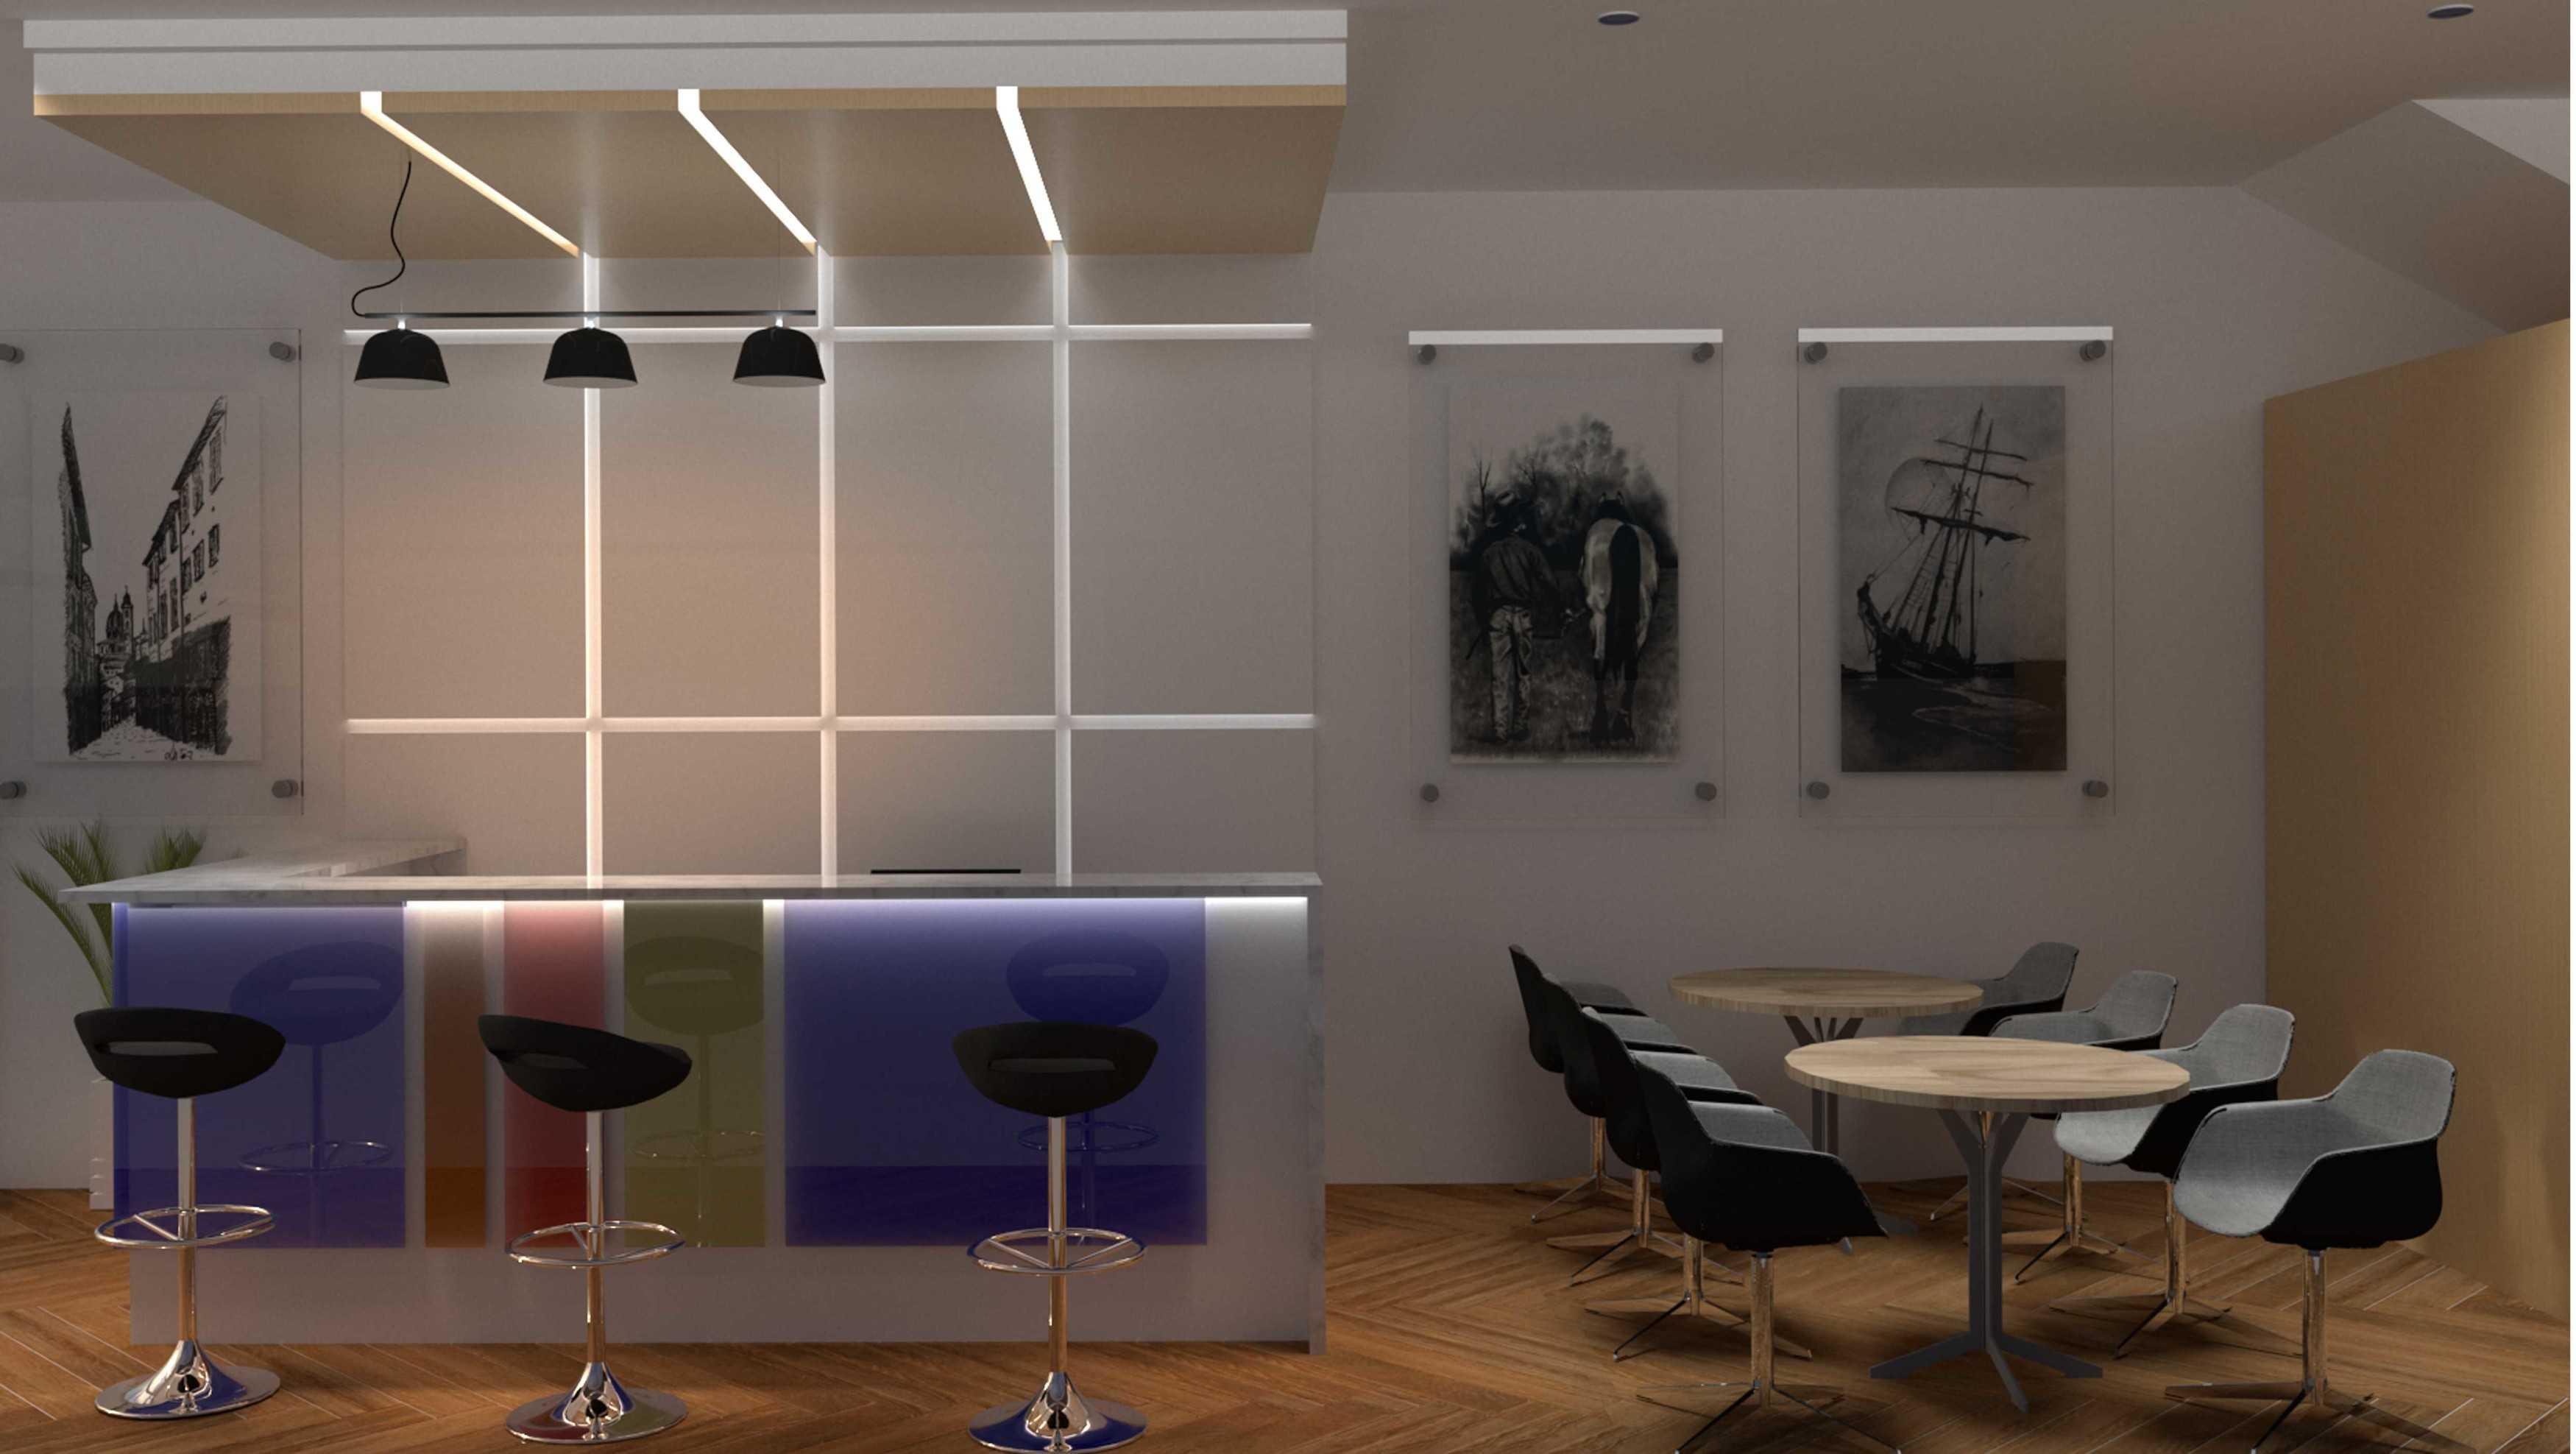 Yrs Design Interior Acrylic Store Kota Tgr. Sel., Kota Tangerang Selatan, Banten, Indonesia Kota Tgr. Sel., Kota Tangerang Selatan, Banten, Indonesia Yrs-Design-Interior-Acrylic-Store   112766